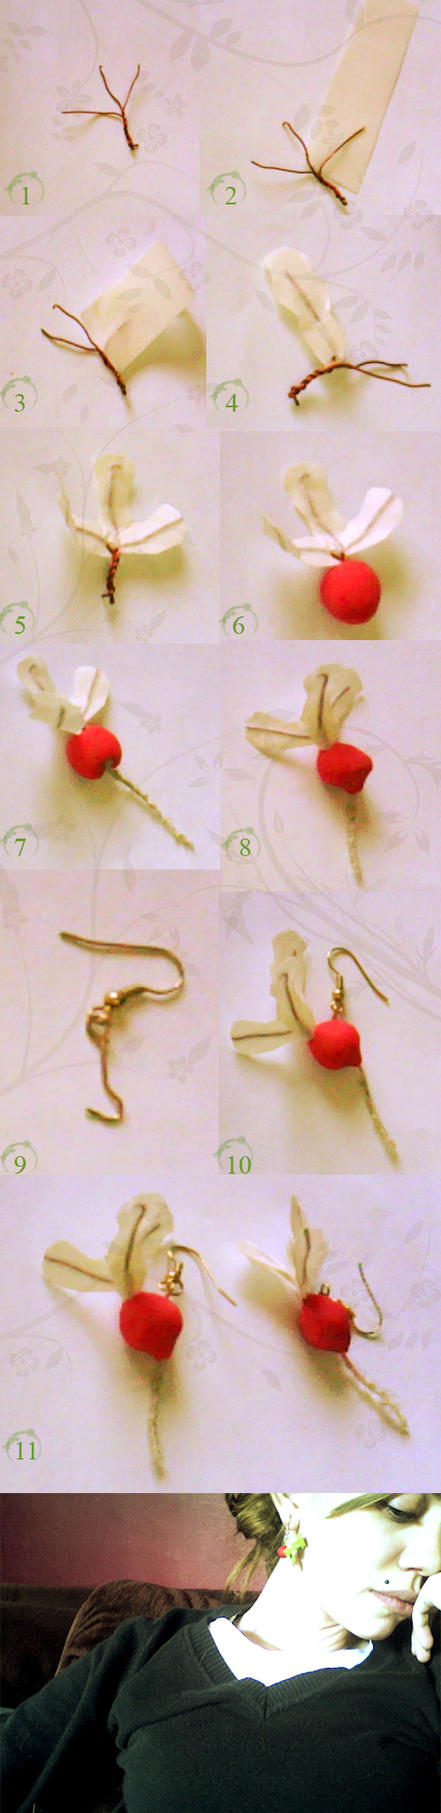 Radish Earrings by IrishWhistler